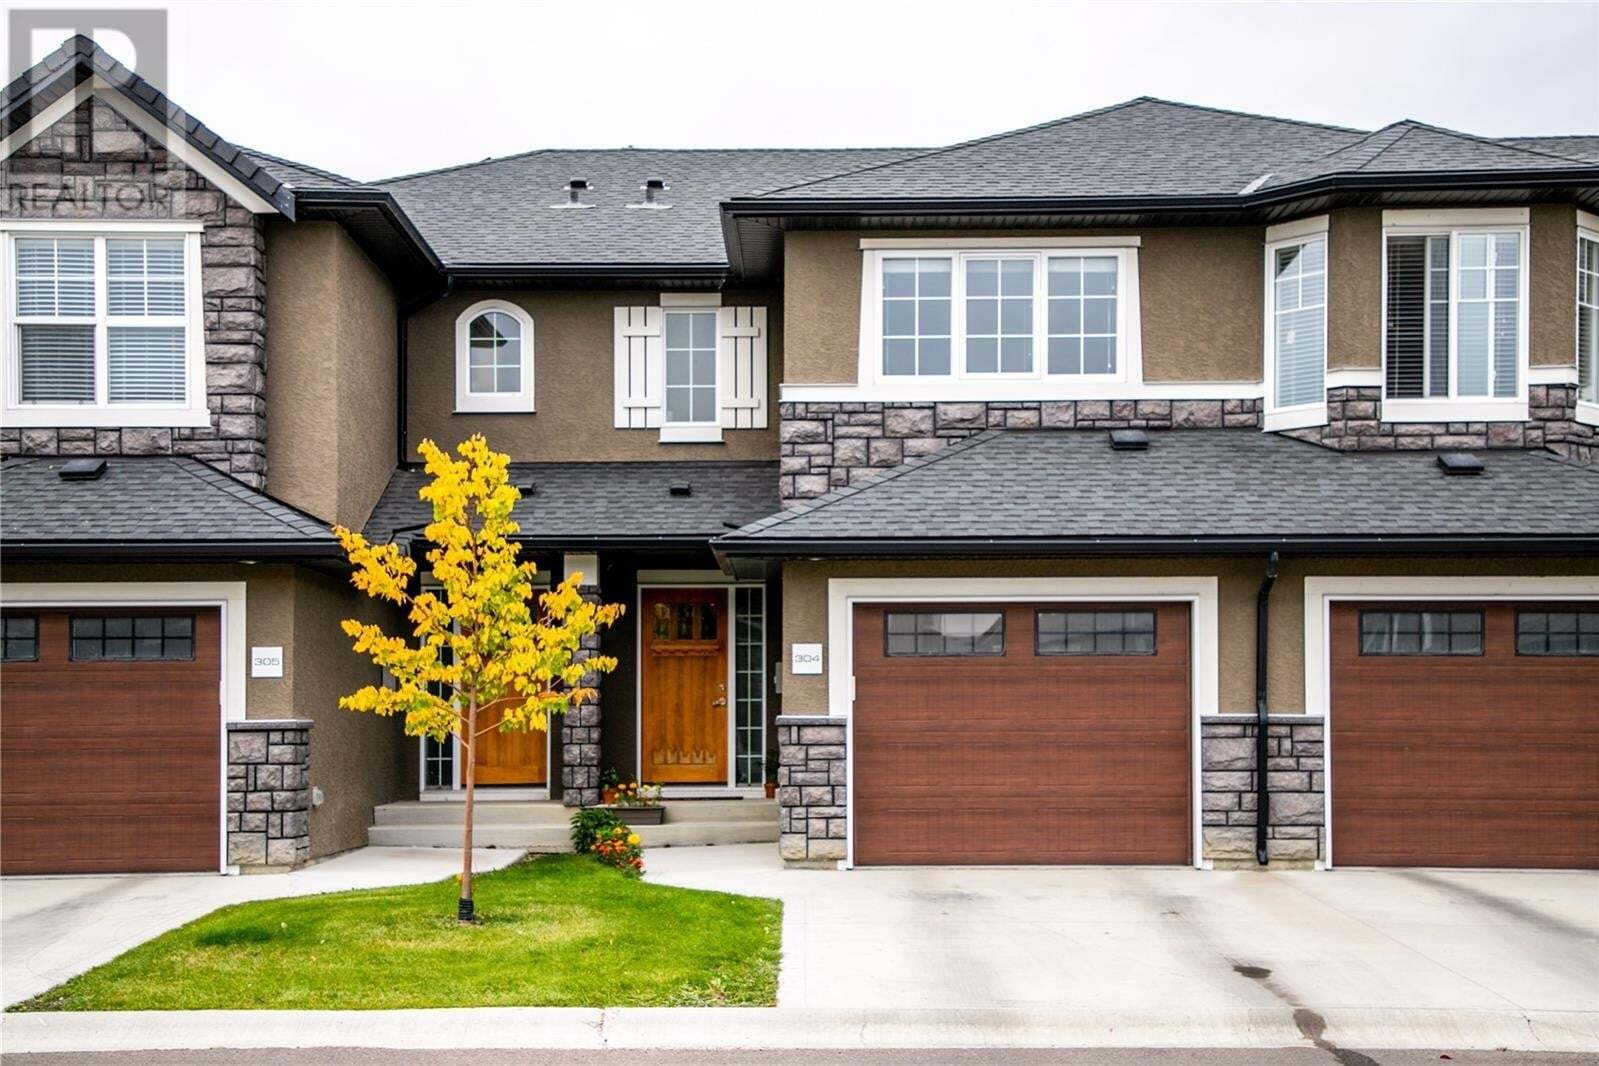 Townhouse for sale at 2007 Pohorecky Cres Unit 304 Saskatoon Saskatchewan - MLS: SK828044